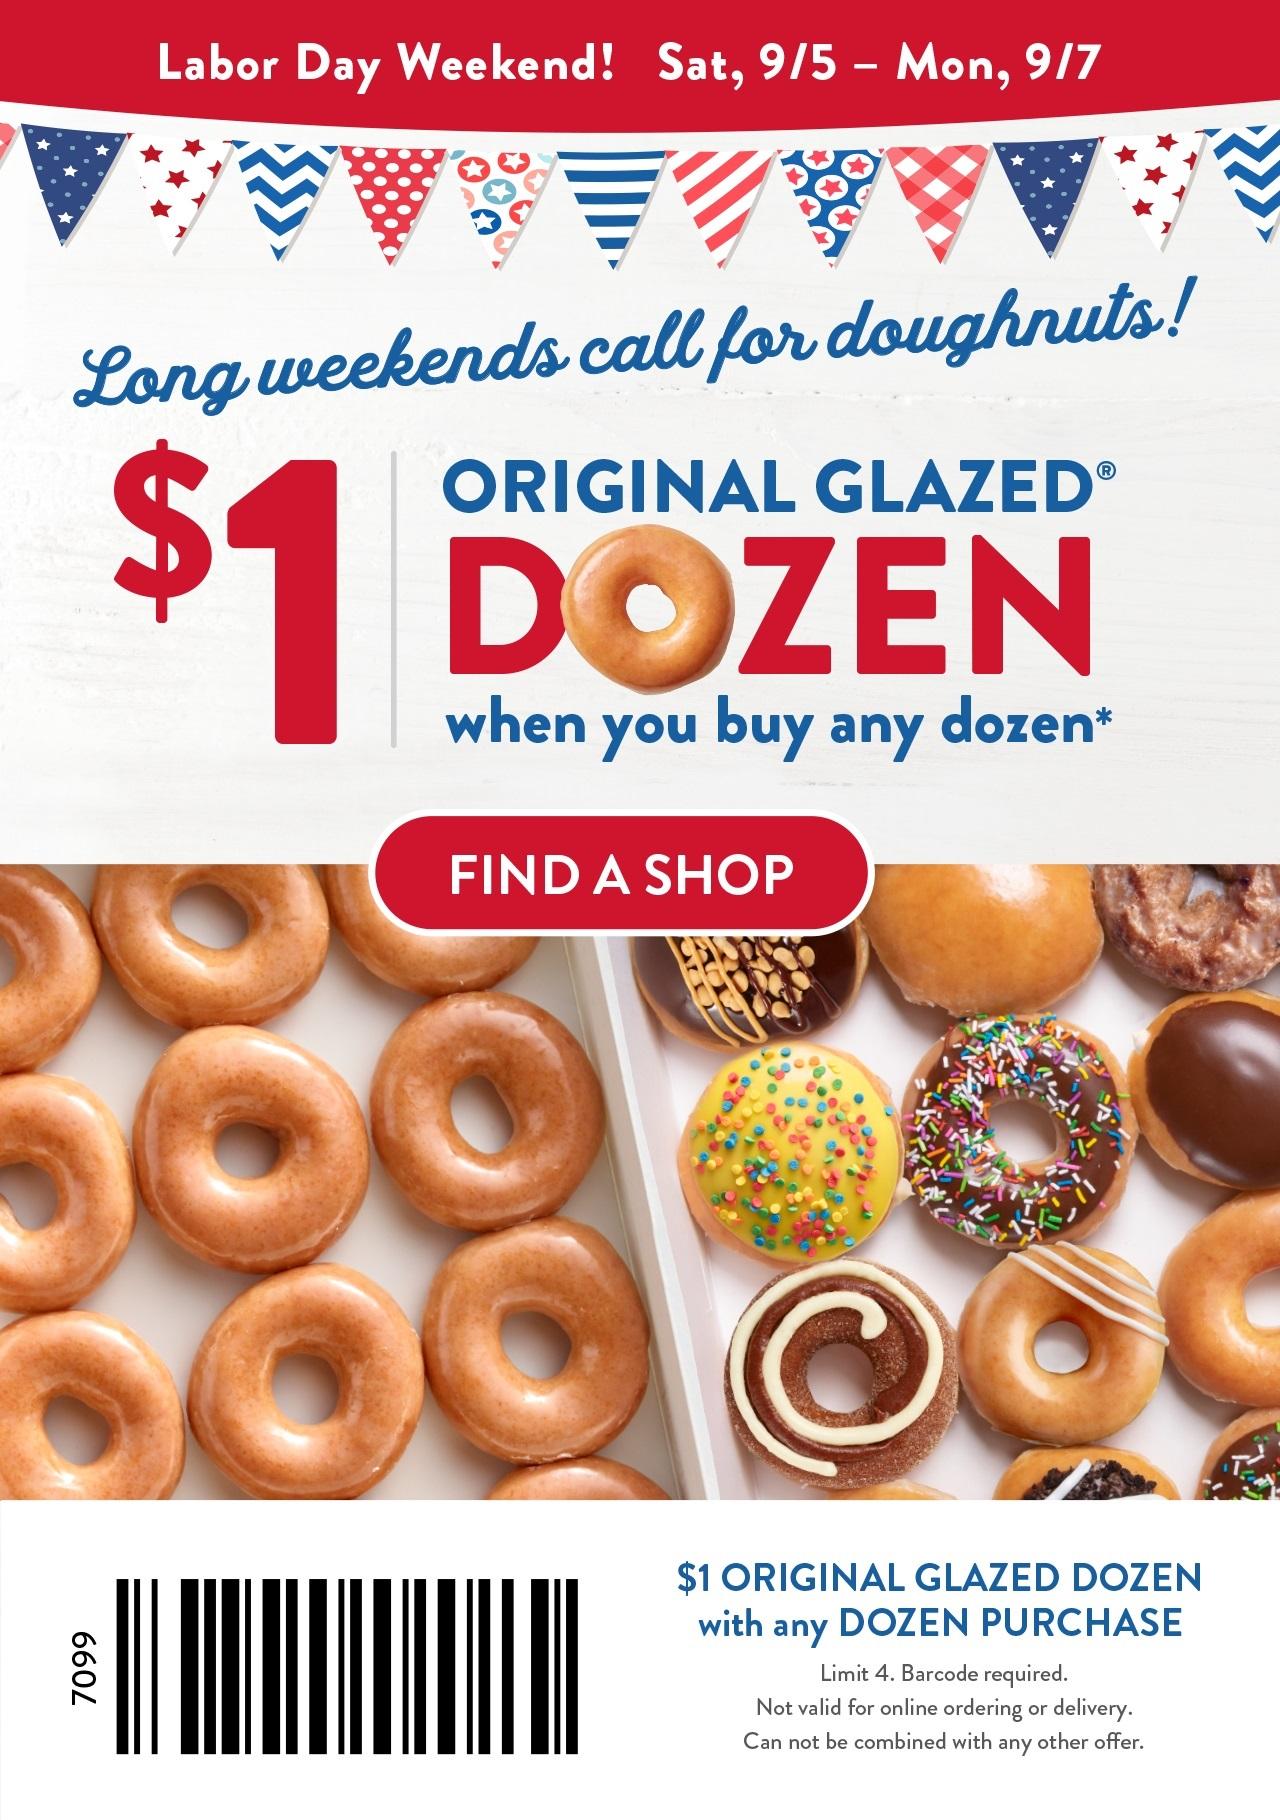 Krispy Kreme - $1 Dozen when you purchase any dozen - Valid 9/5 - 9/7